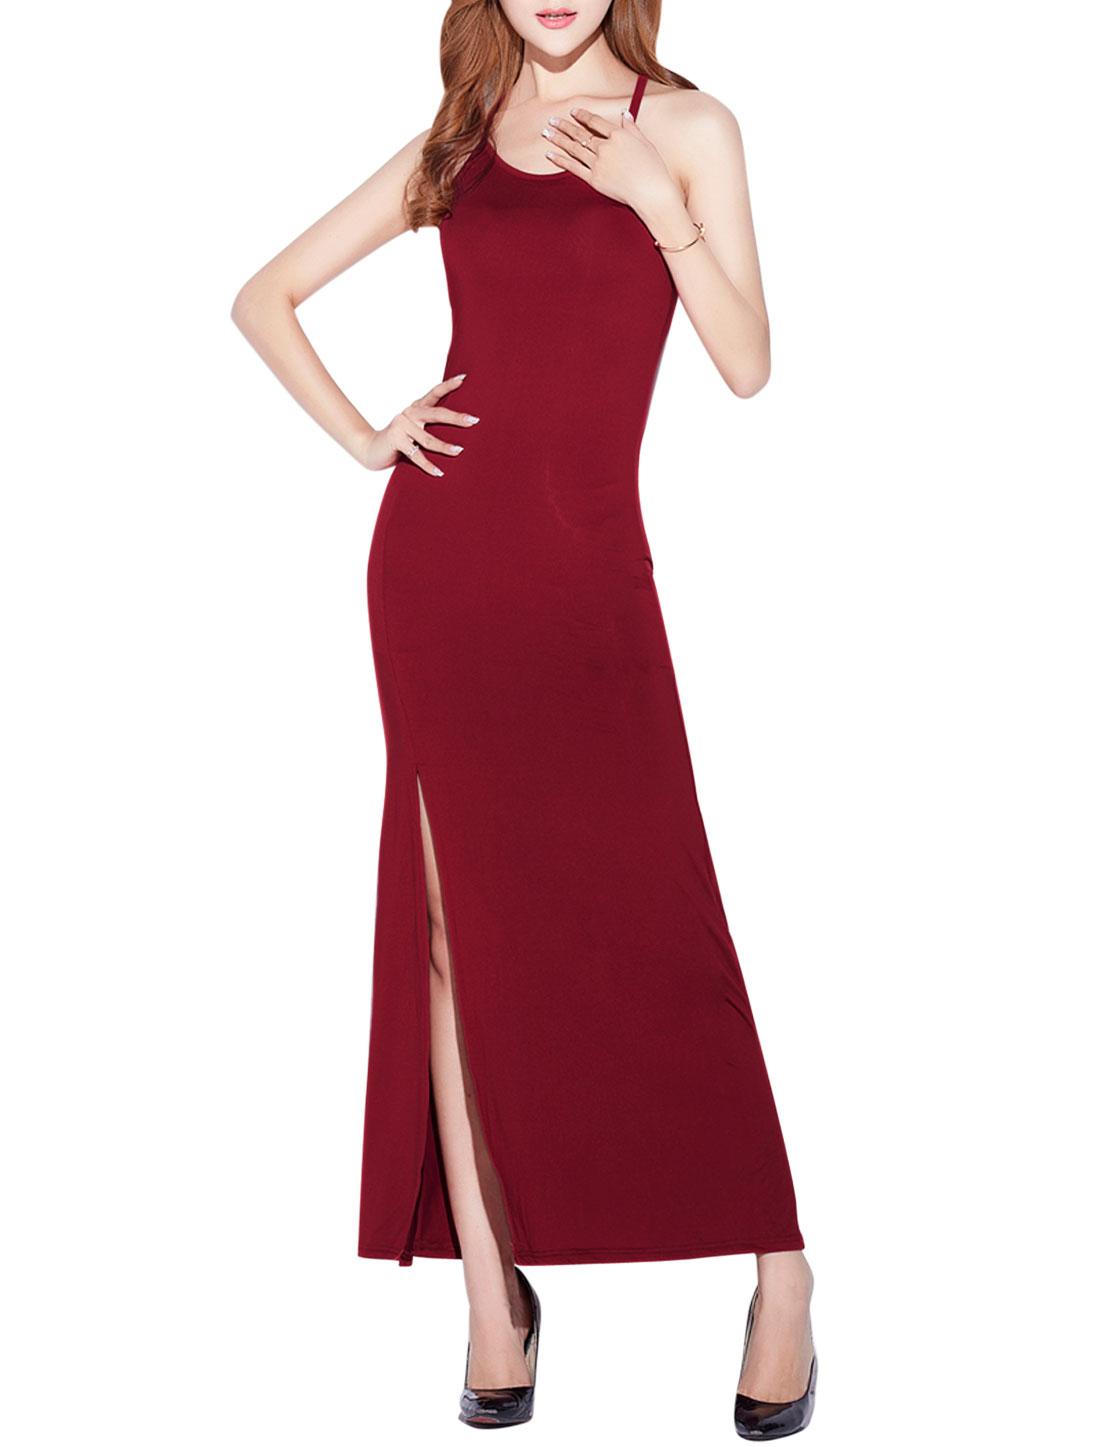 Ladies Round Neck Sleeveless Split Front Long Dresses Burgundy M